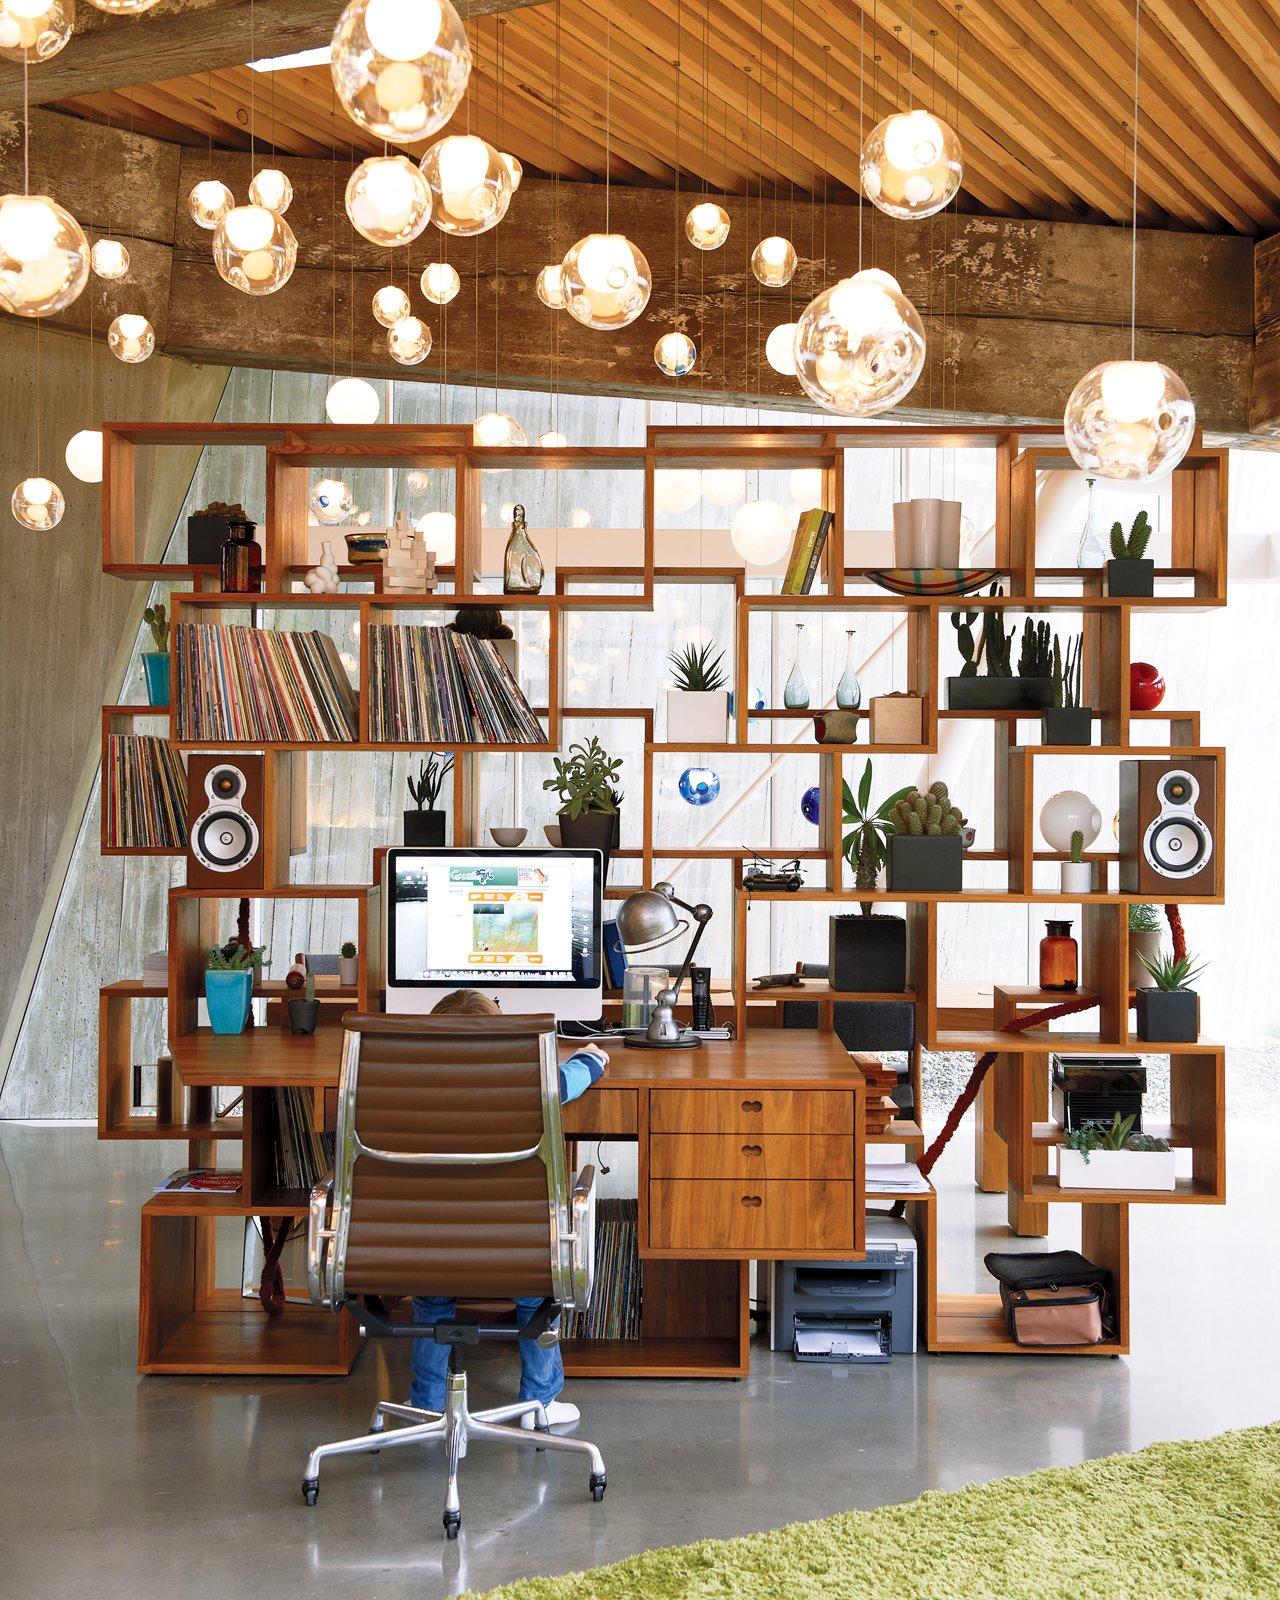 #office #lighting #circleceilinglamp #bookcase #stackedshelving #woodshelving #interior #inside #workspace #storage